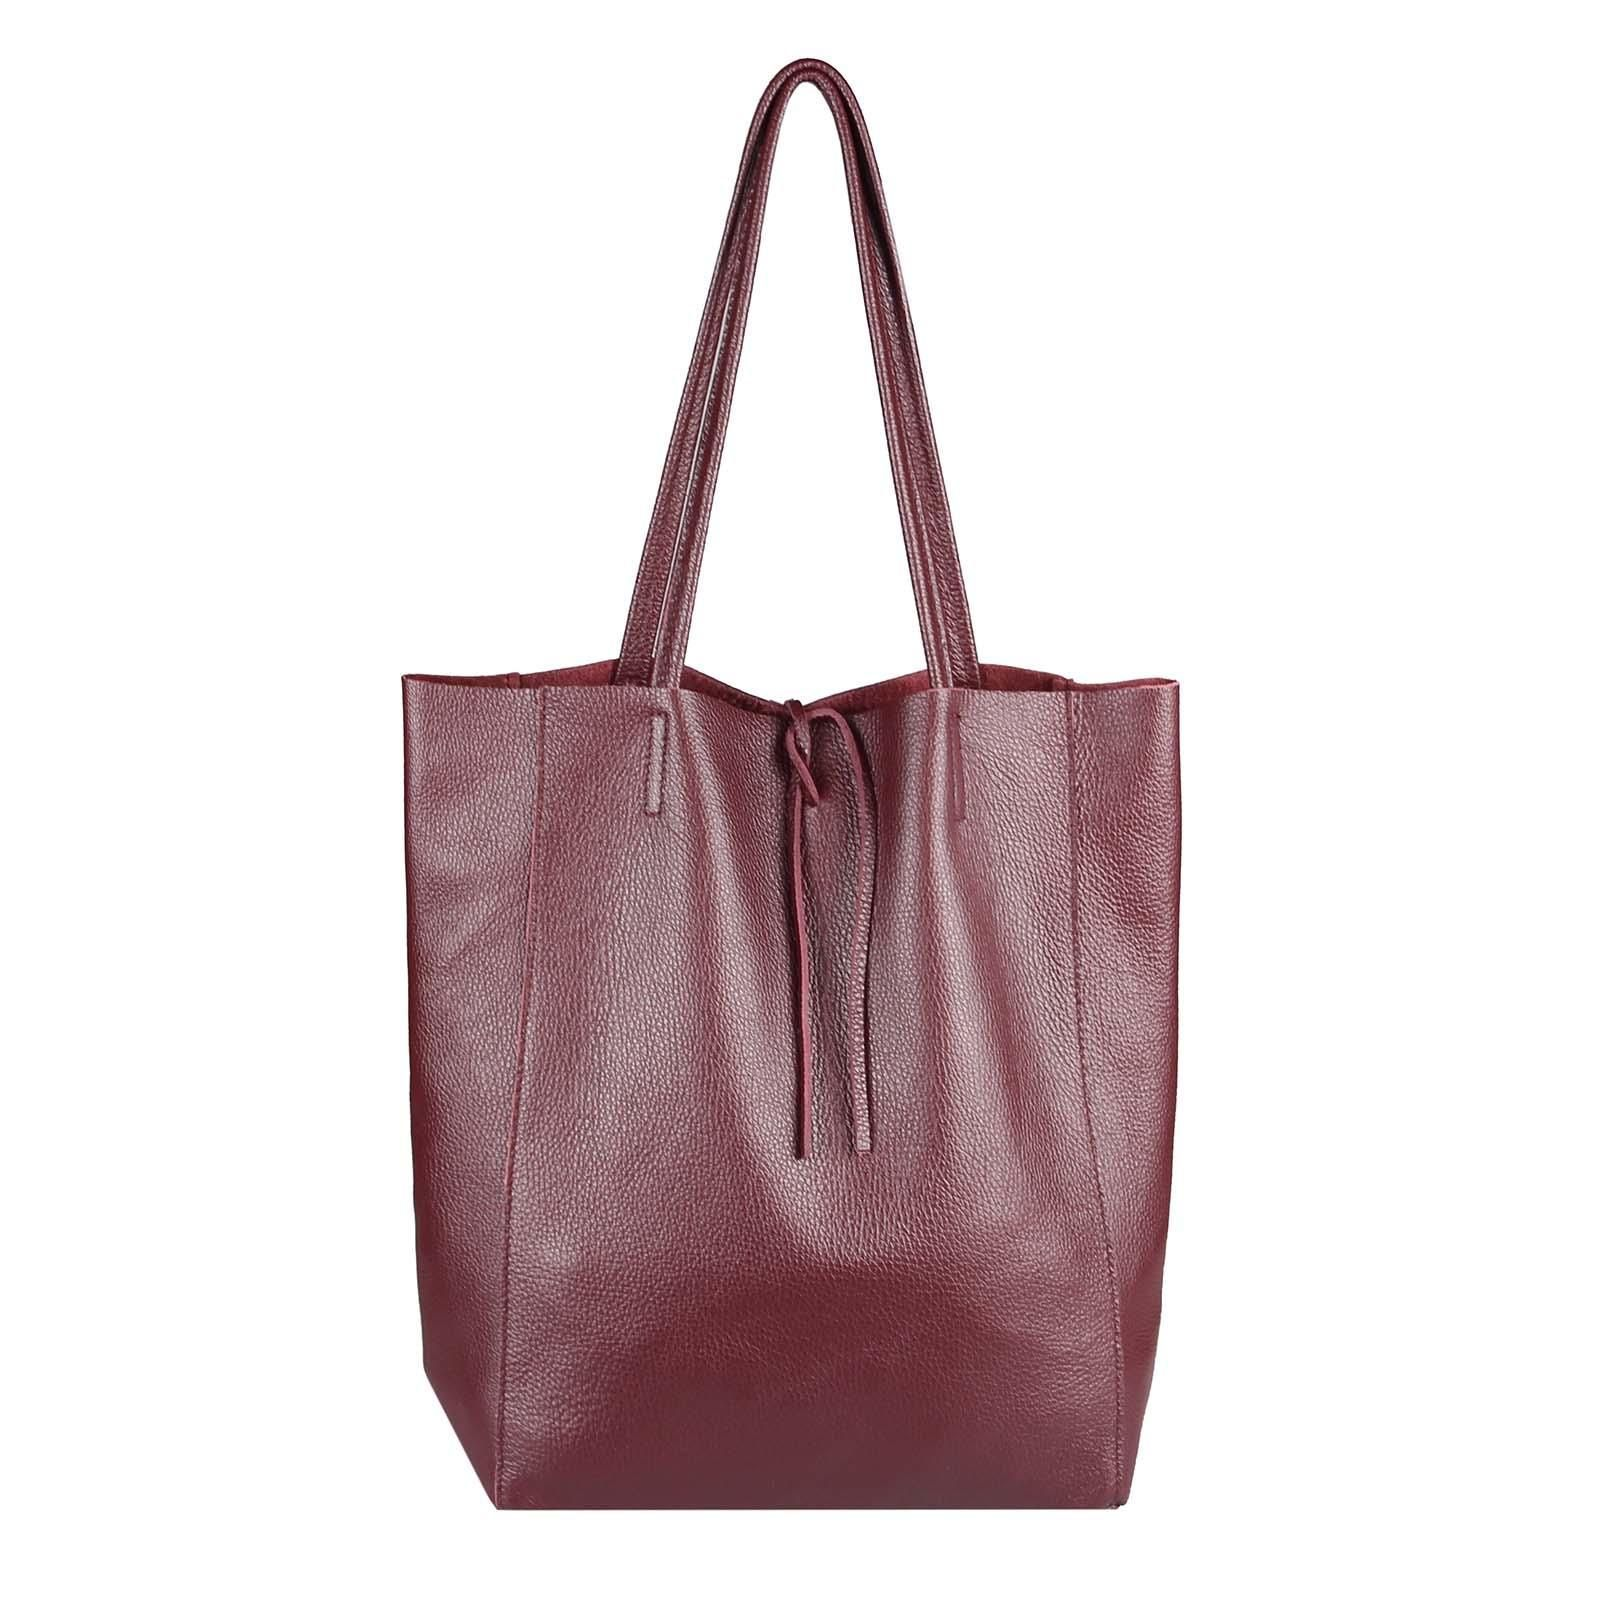 Obc Made In Italy Damen Leder Tasche Din A4 Shopper Schultertasche Henkeltasche Tote Bag M Metallic Tote Bags Leather Bag Women Vintage Leather Messenger Bag